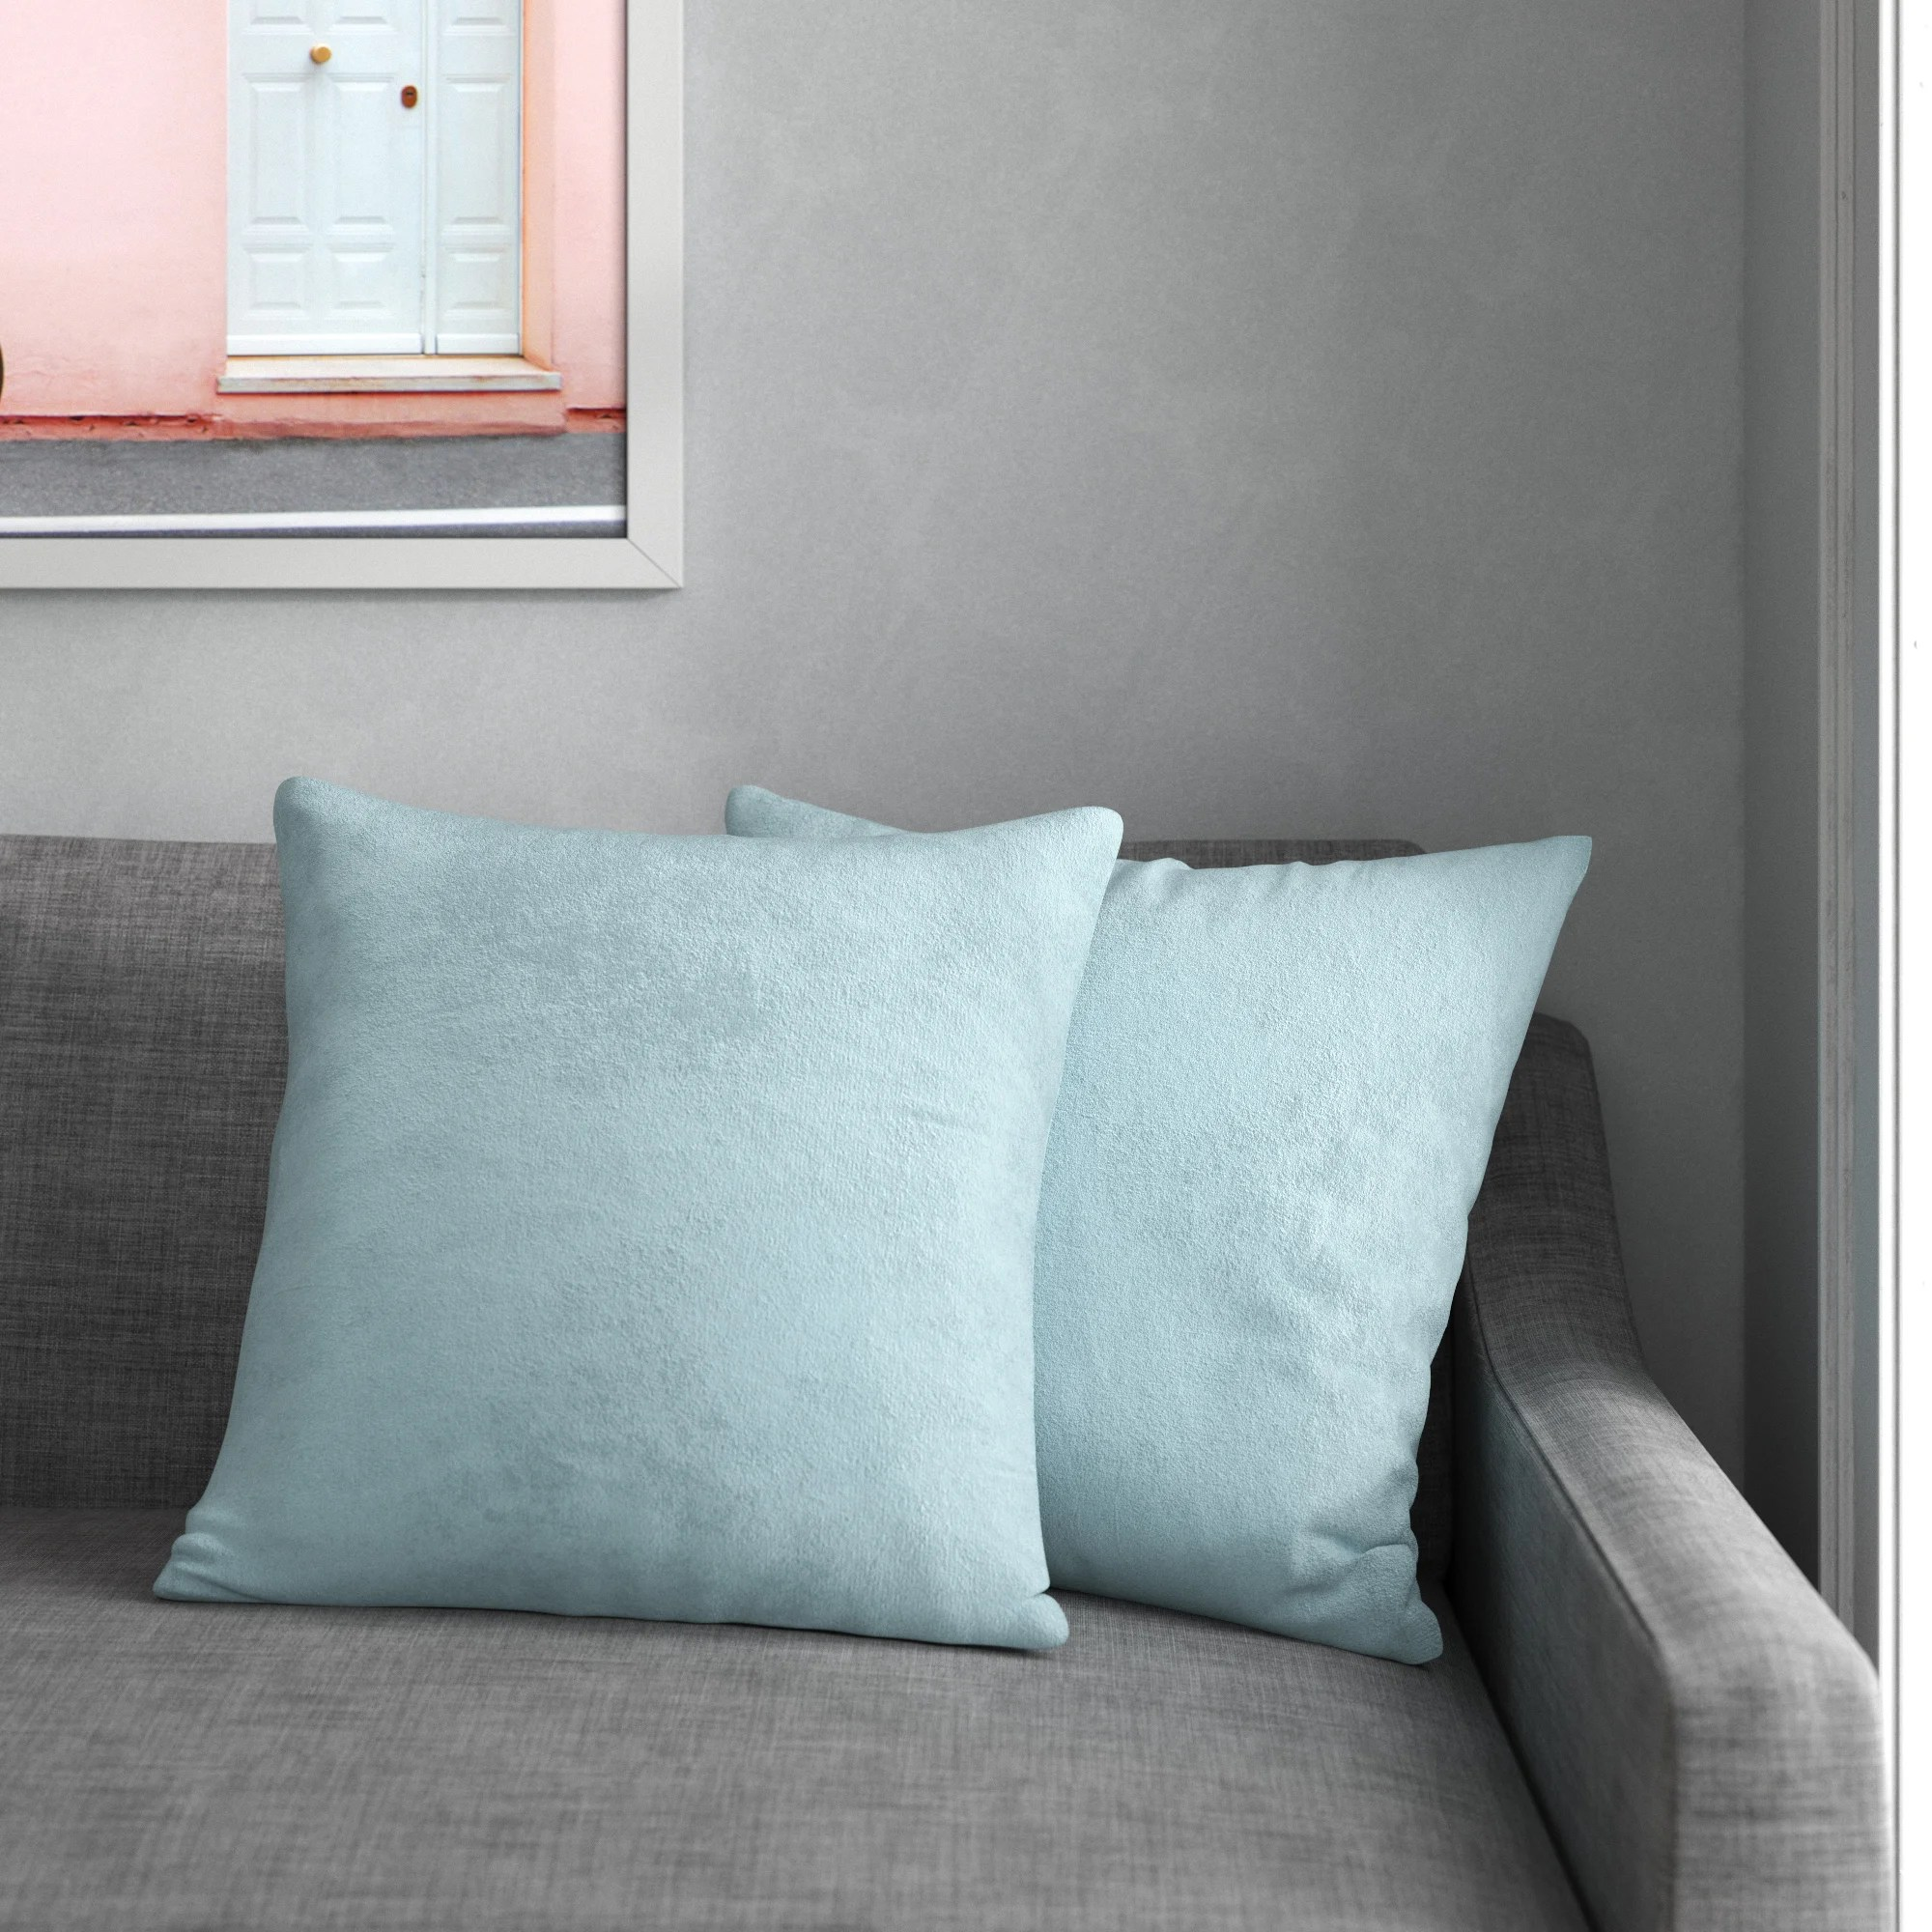 Extended Cyber Monday Sale On Throw Pillows Wayfair